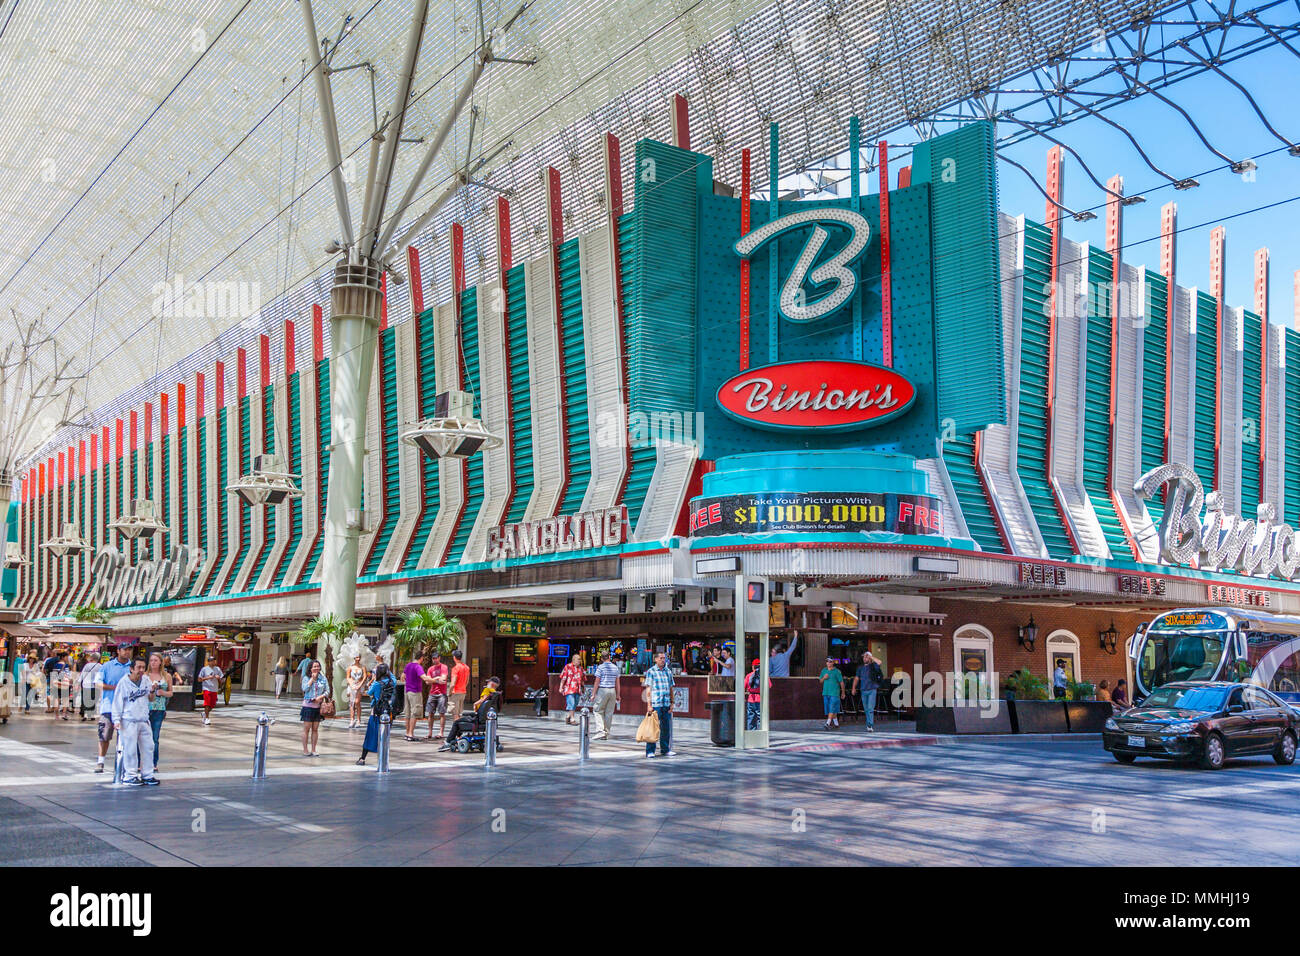 binions gambling hall casino